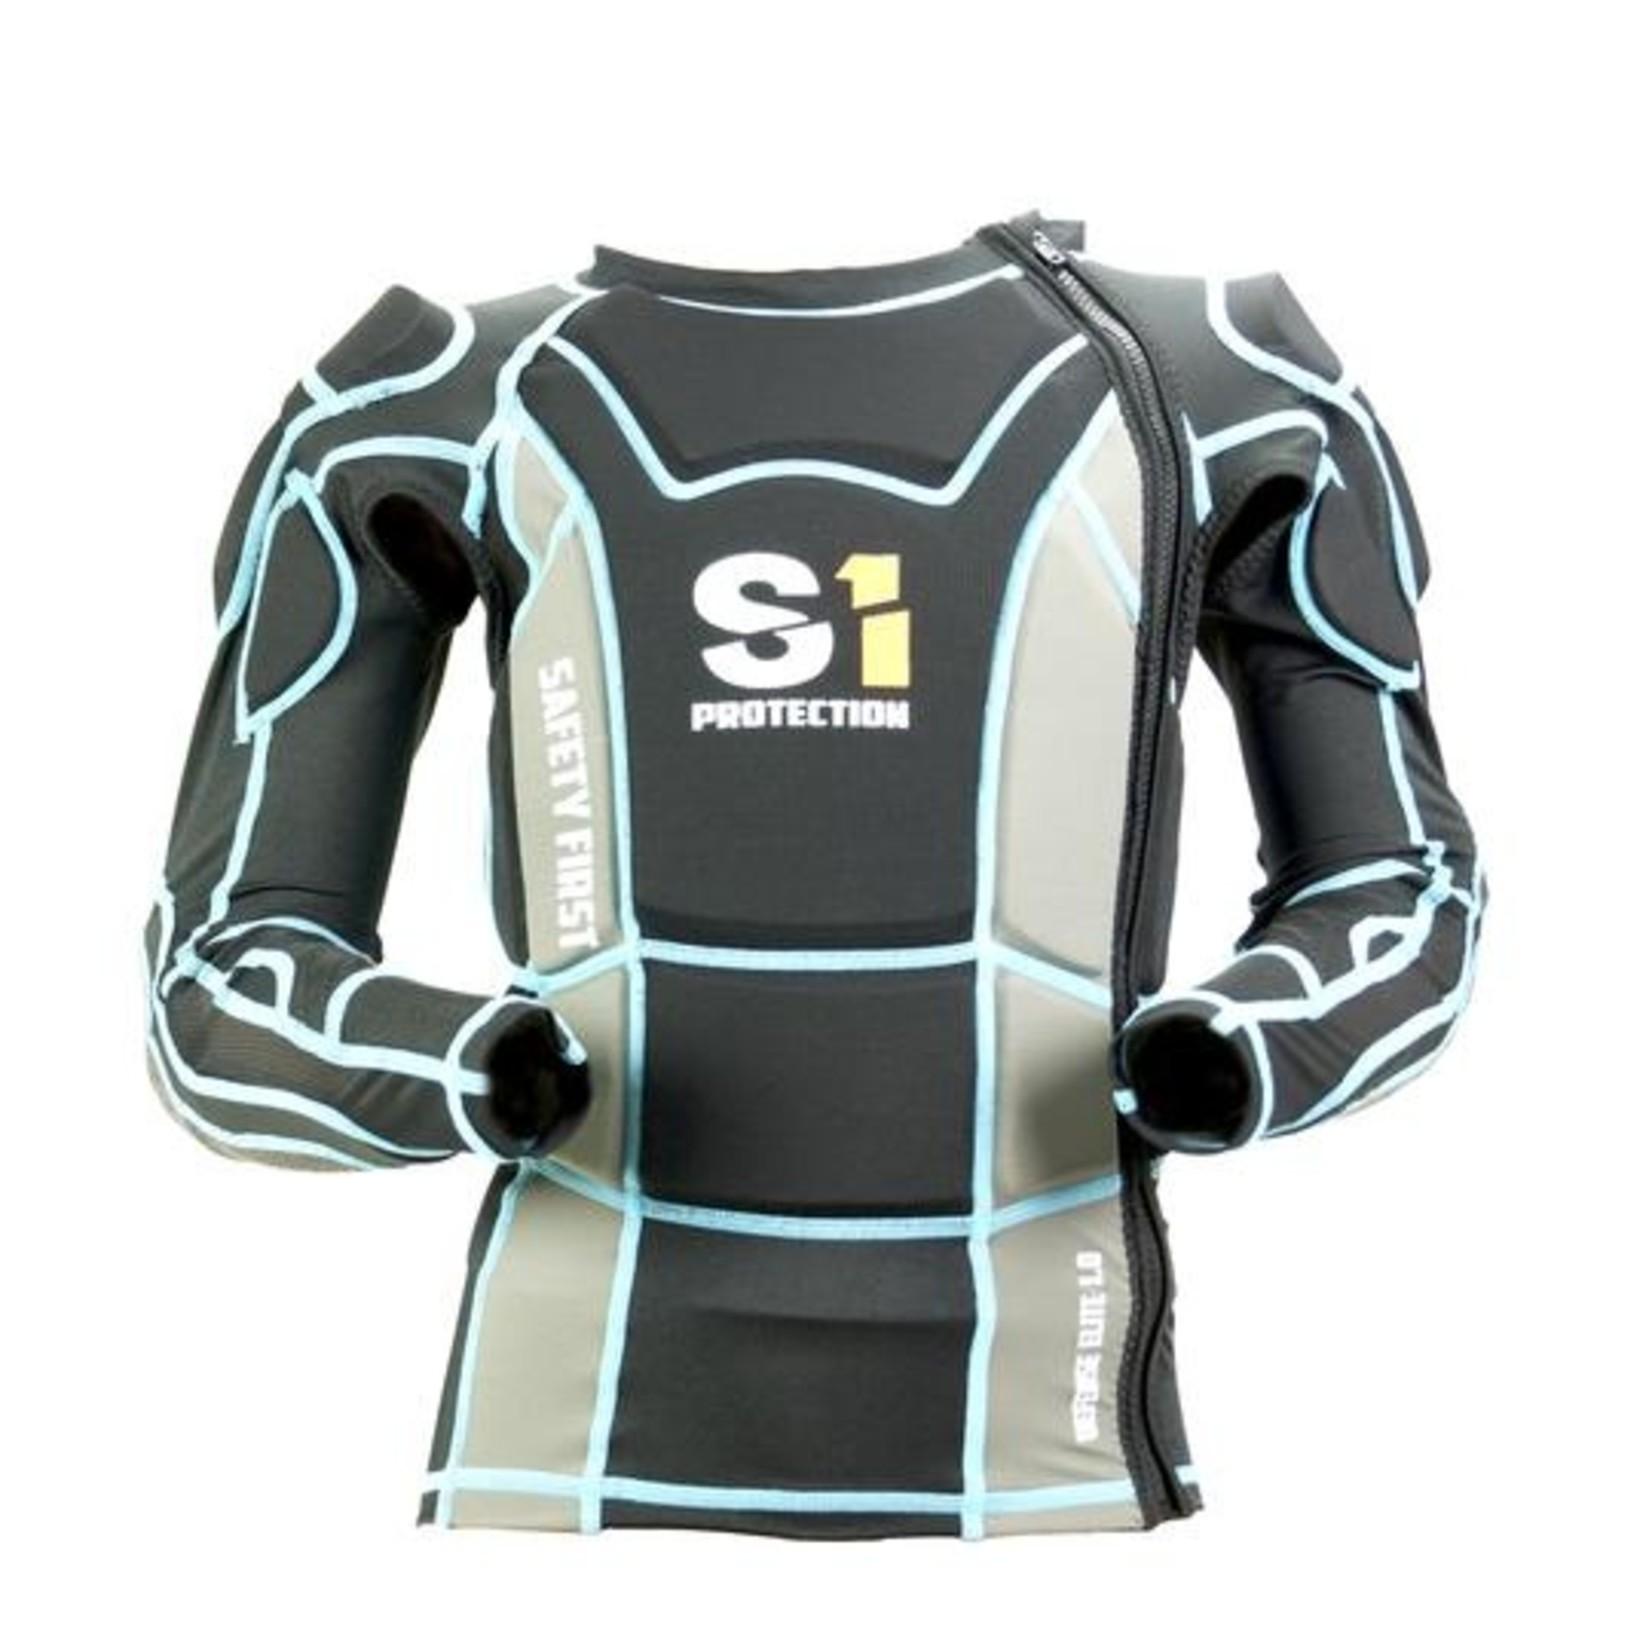 S1 Elite 1.0 Protective Jersey Yth XL